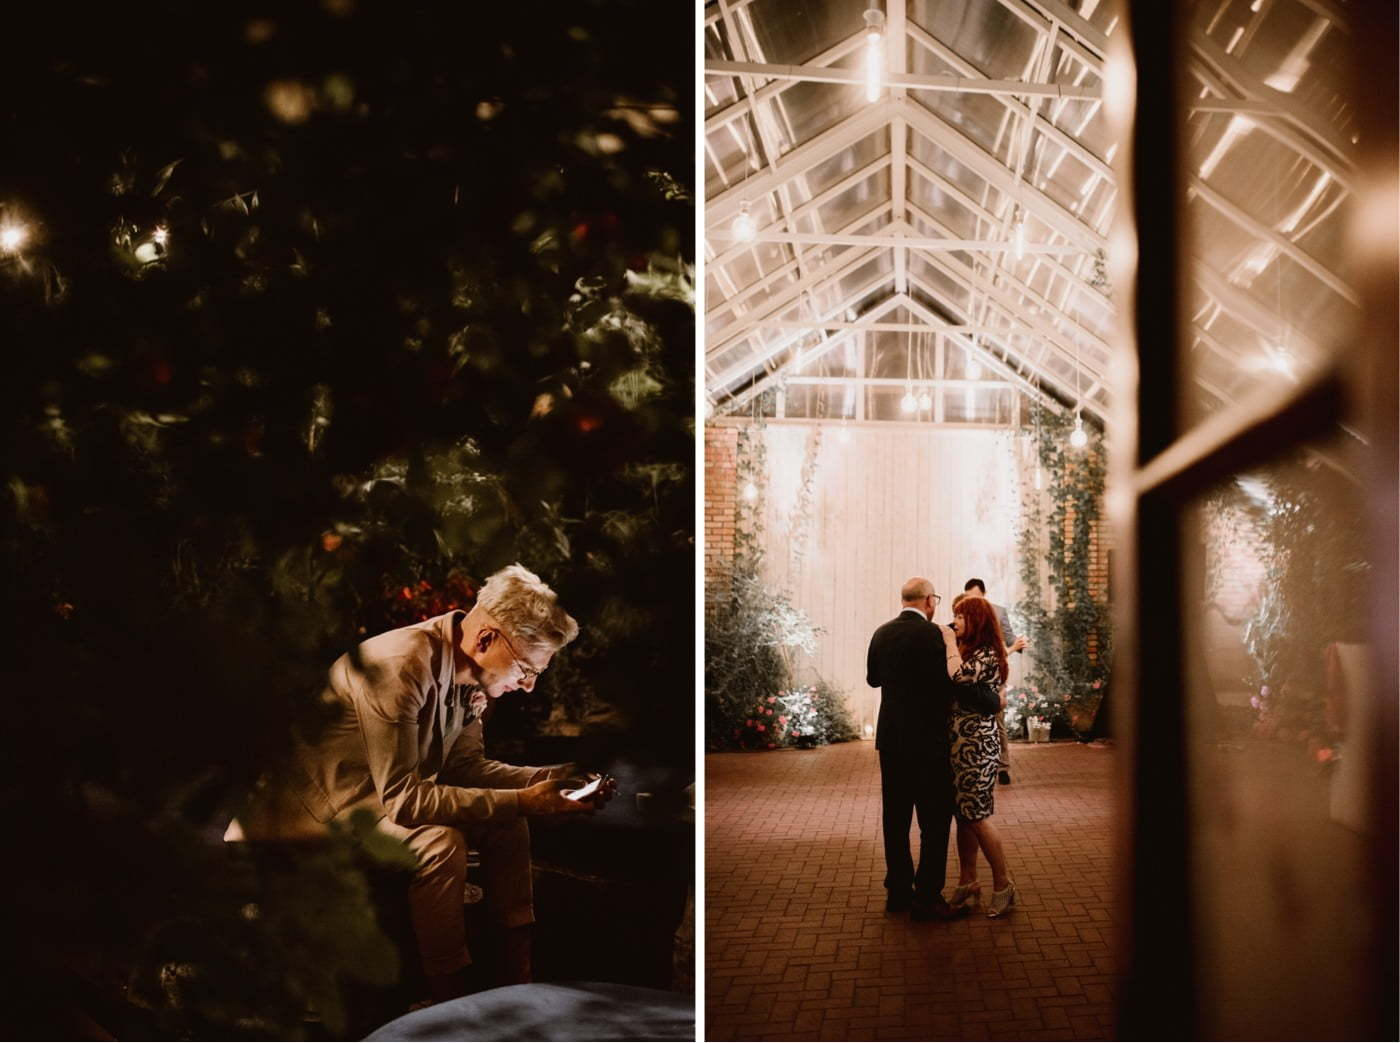 ewelina zieba rustykalne wesele stara oranzeria warszawa 101